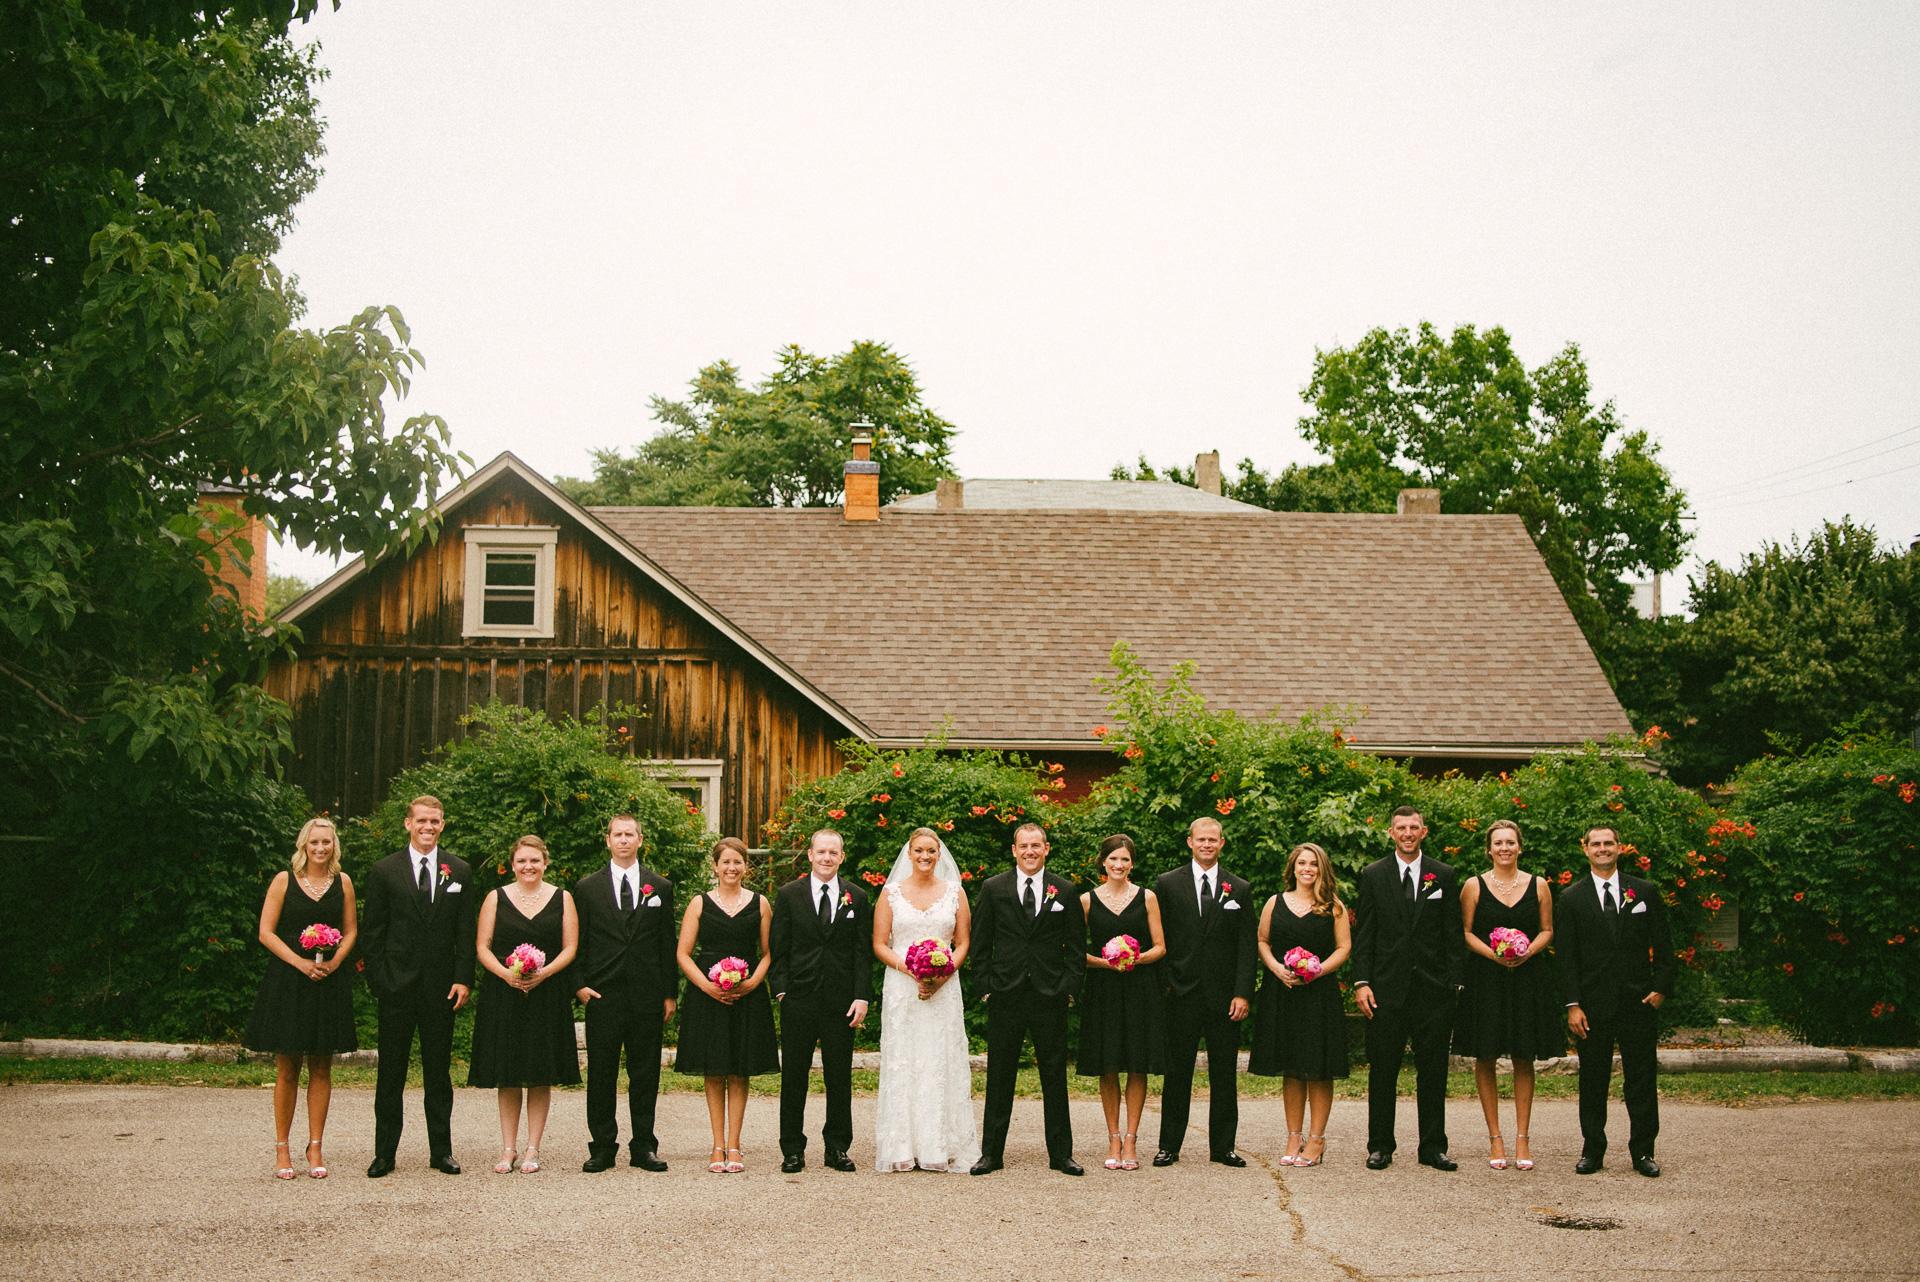 Dayton Wedding Photographer - Bridal Party